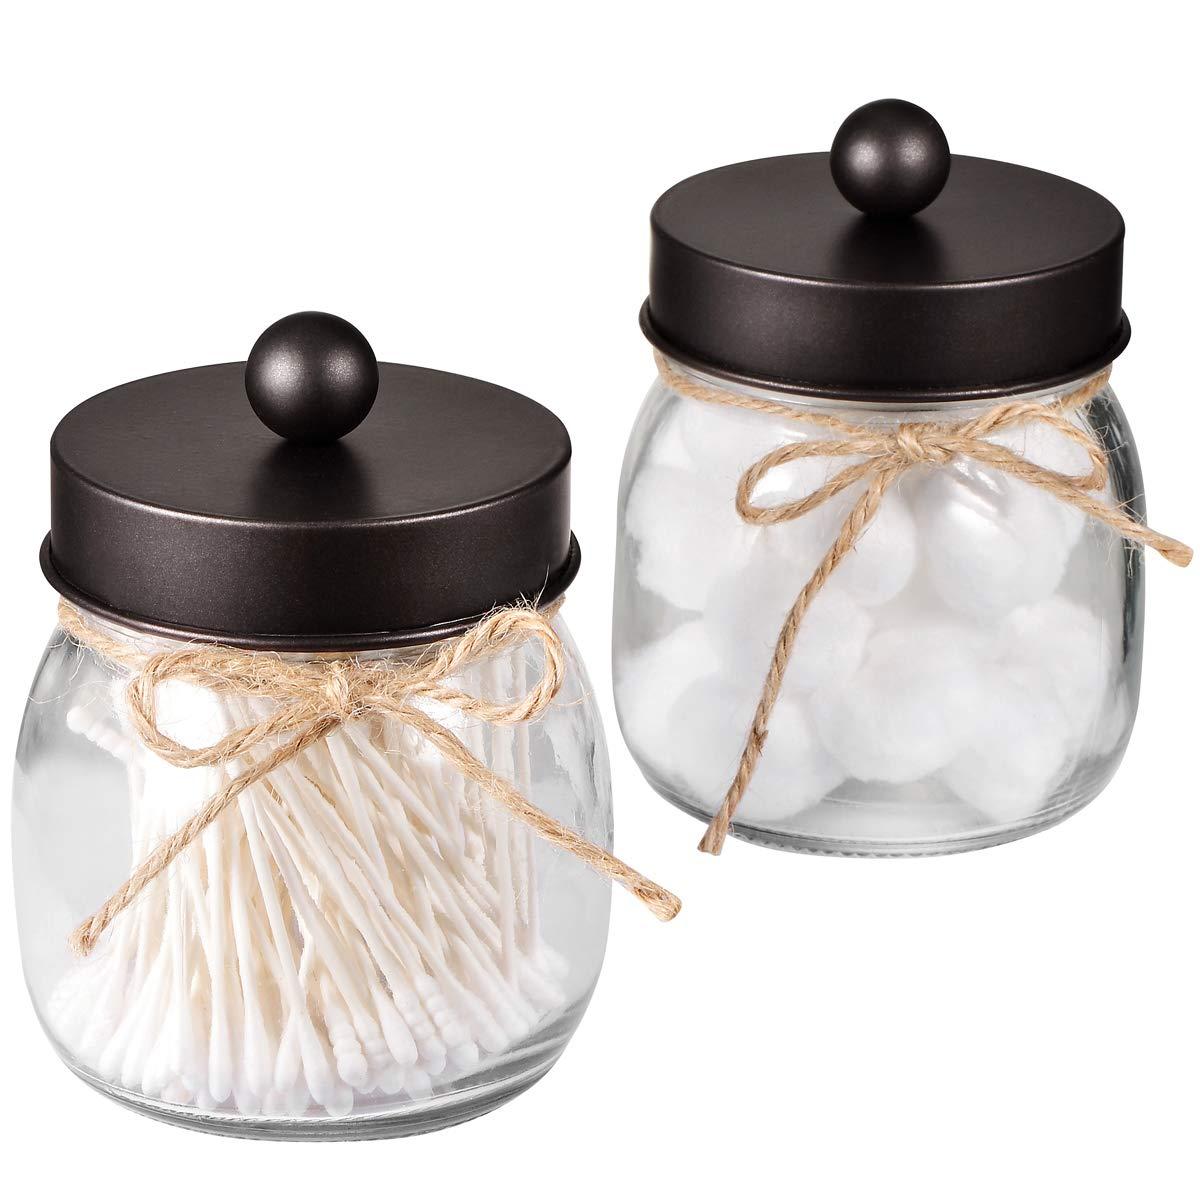 SheeChung Mason Jar Bathroom Apothecary Jars - Rustproof Stainless Steel Lid,Farmhouse Decor,Bathroom Vanity Storage Organizer Holder Glass for Qtips,Cotton Swabs,Ball,Bath Salts (Bronze, 2-Pack)